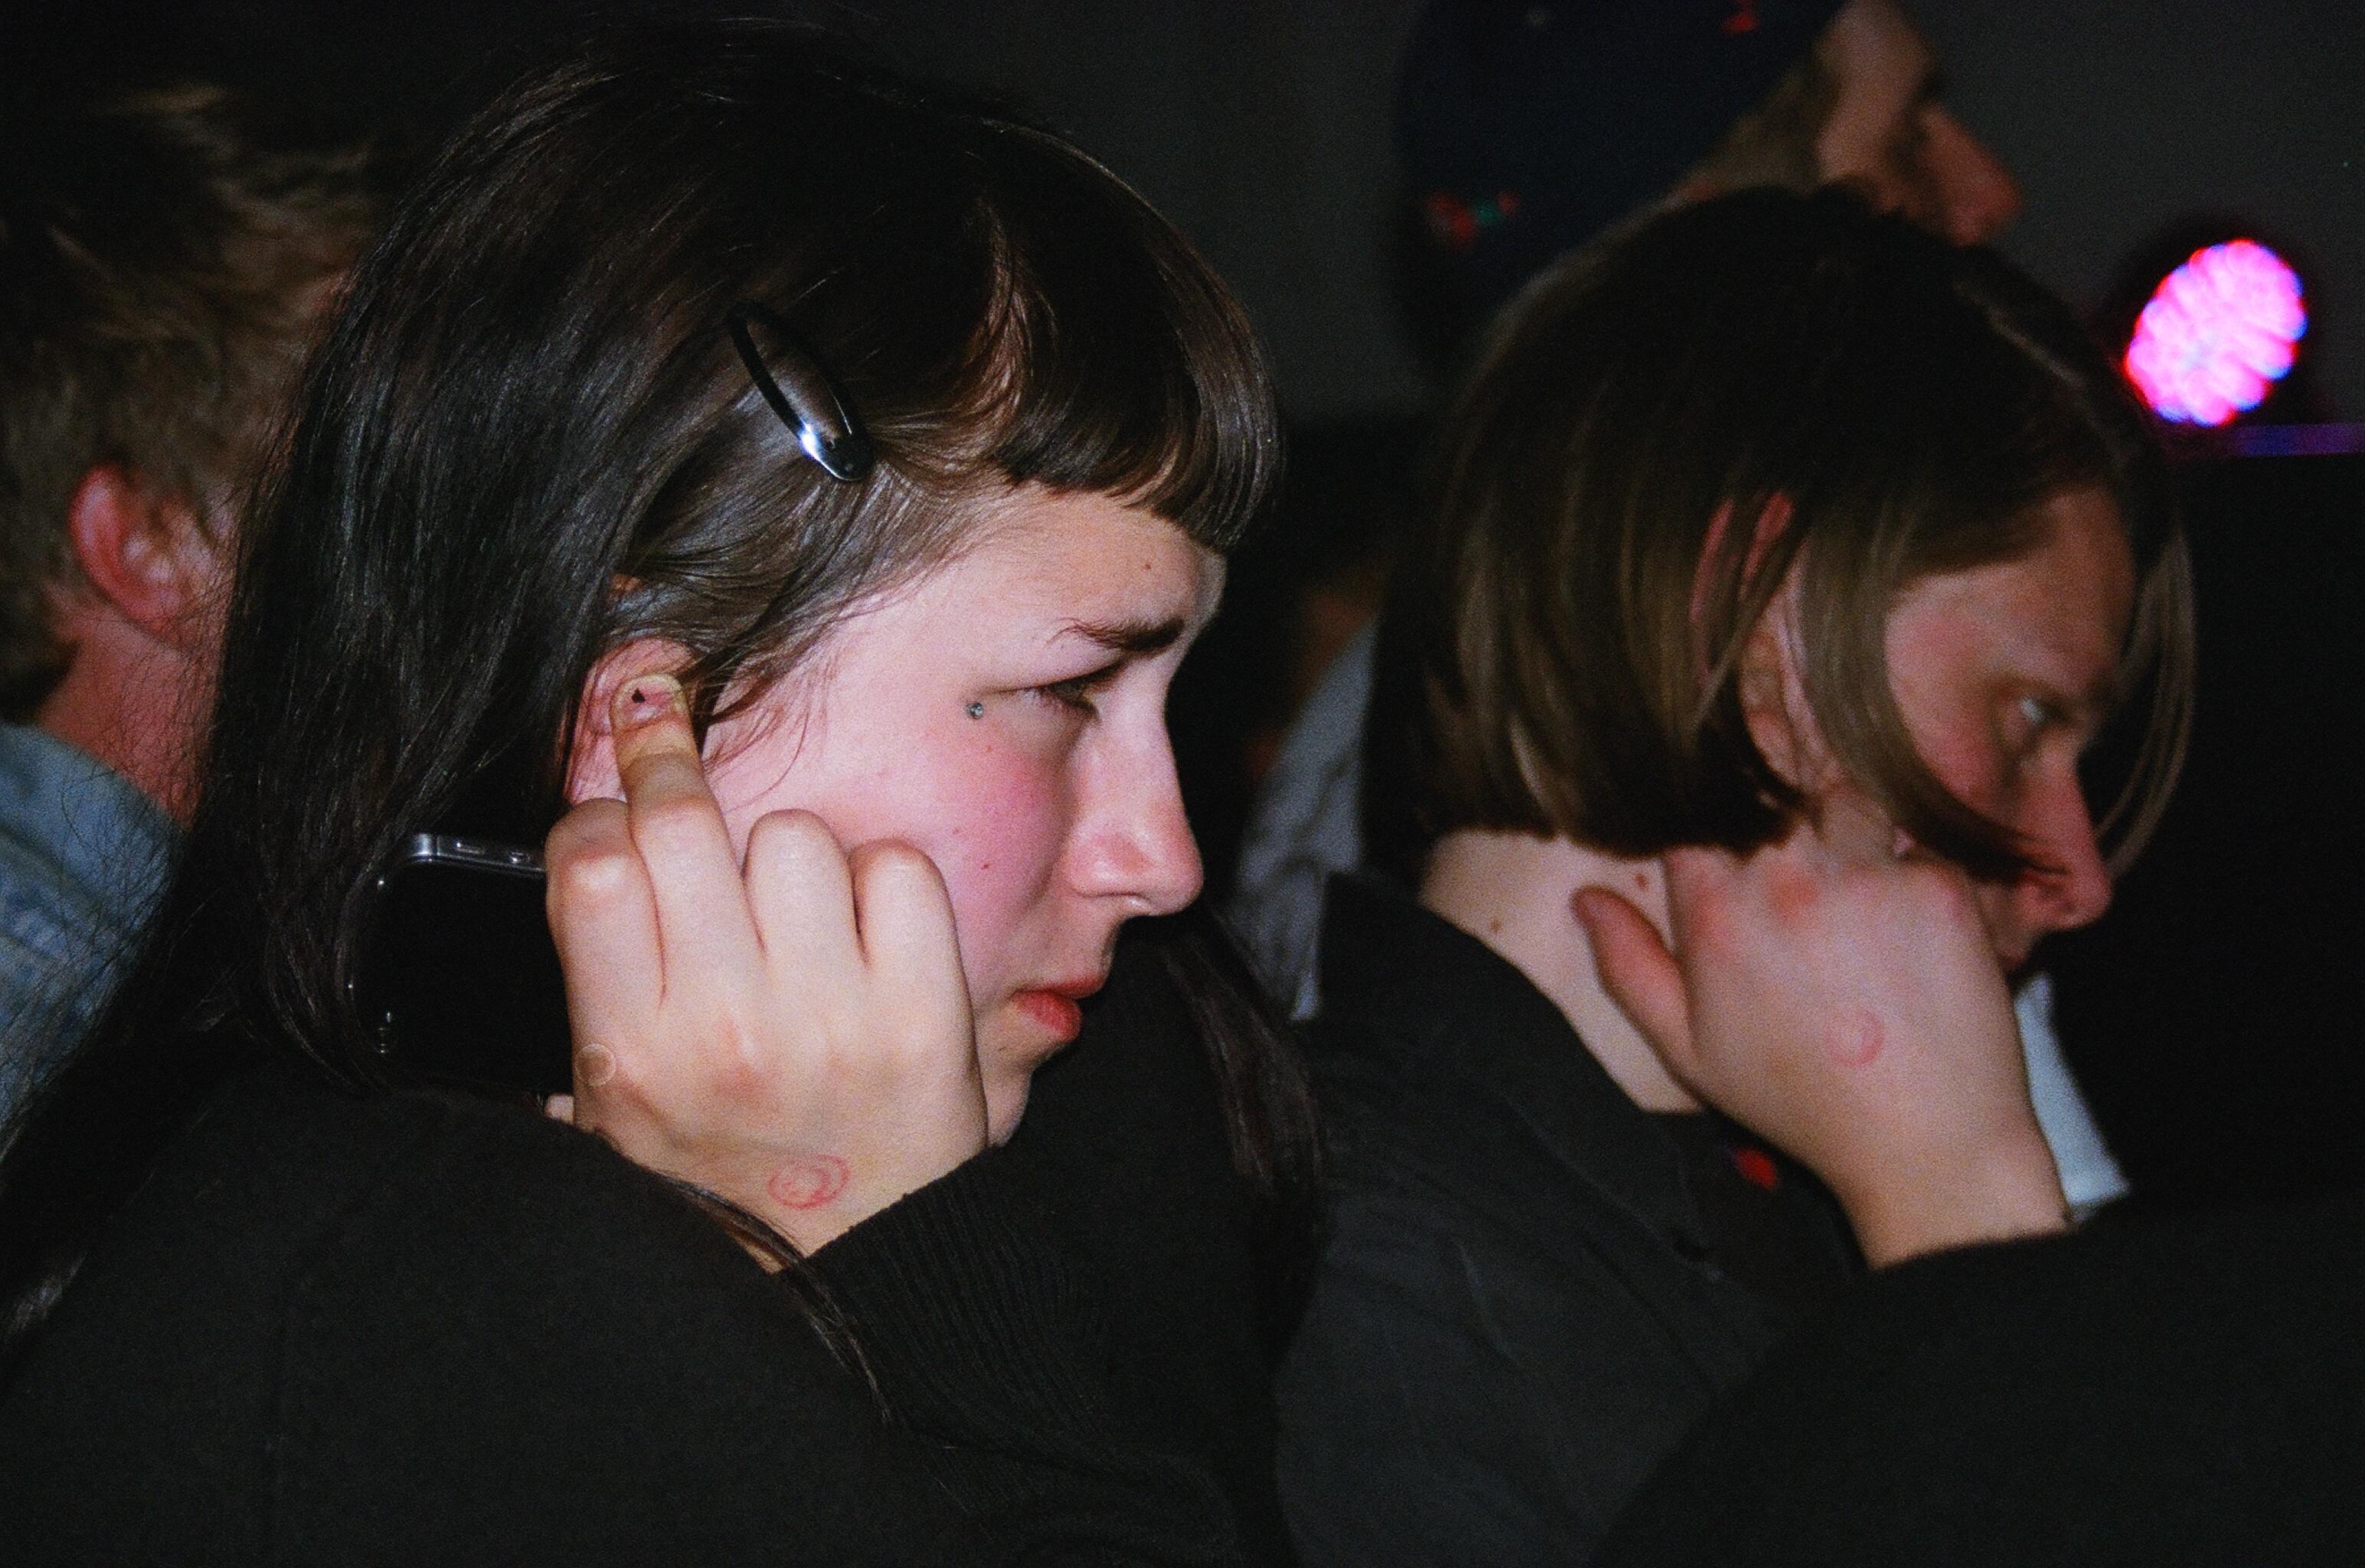 Crowds reaction to Pharmakon.